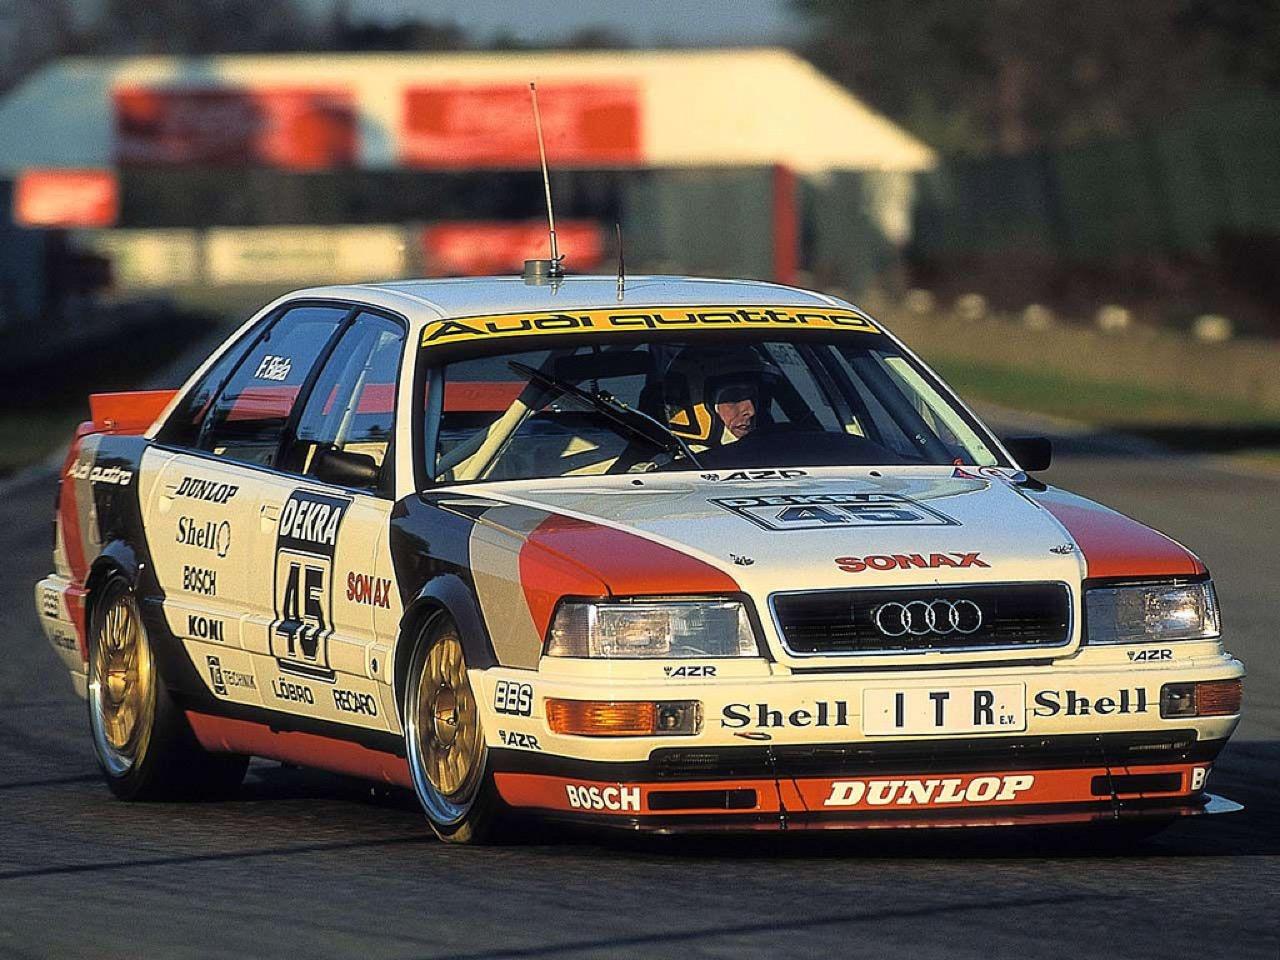 Audi 80 V6 DTM... V6 ? DTM ? C'est quoi c'bordel ?! 5